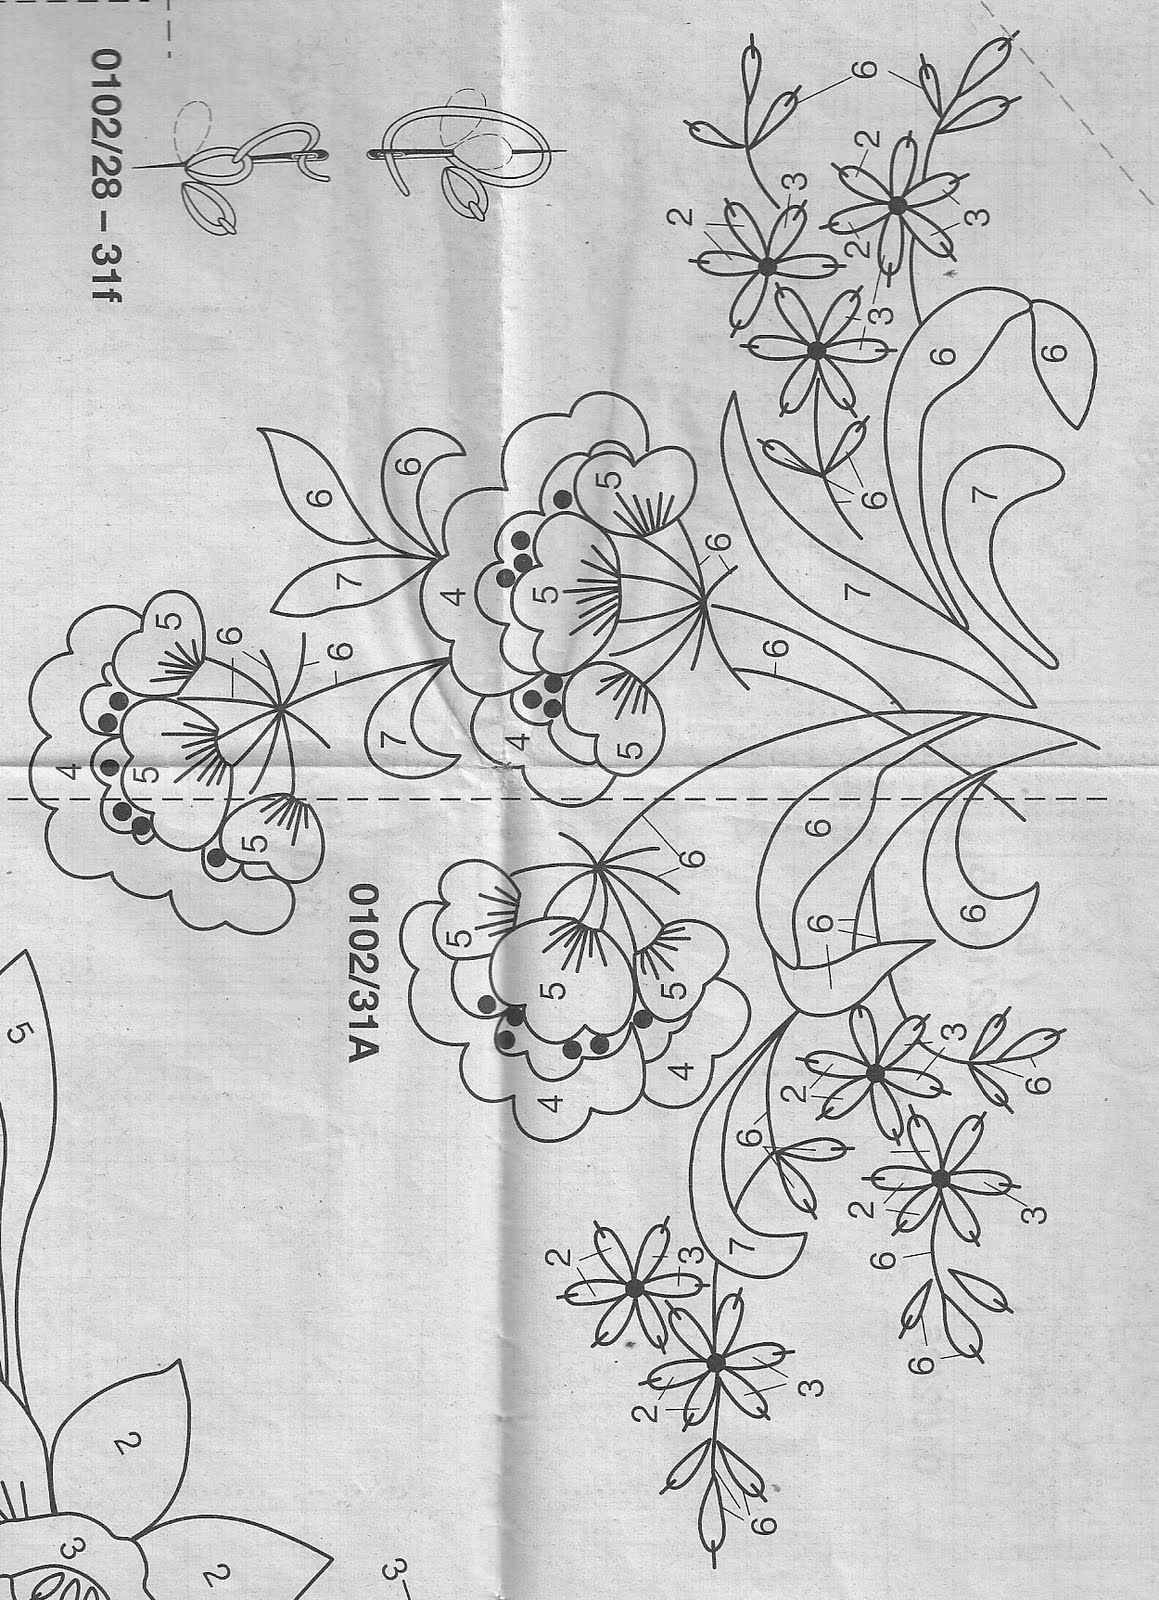 مفرش تطريز يدوي بالباترون من مجله Anna Magazine Handmade Embroidry With Pattern شغل ابره Needle Crafts Oya Ornekleri Crewel Embroidery Nakis Desenleri